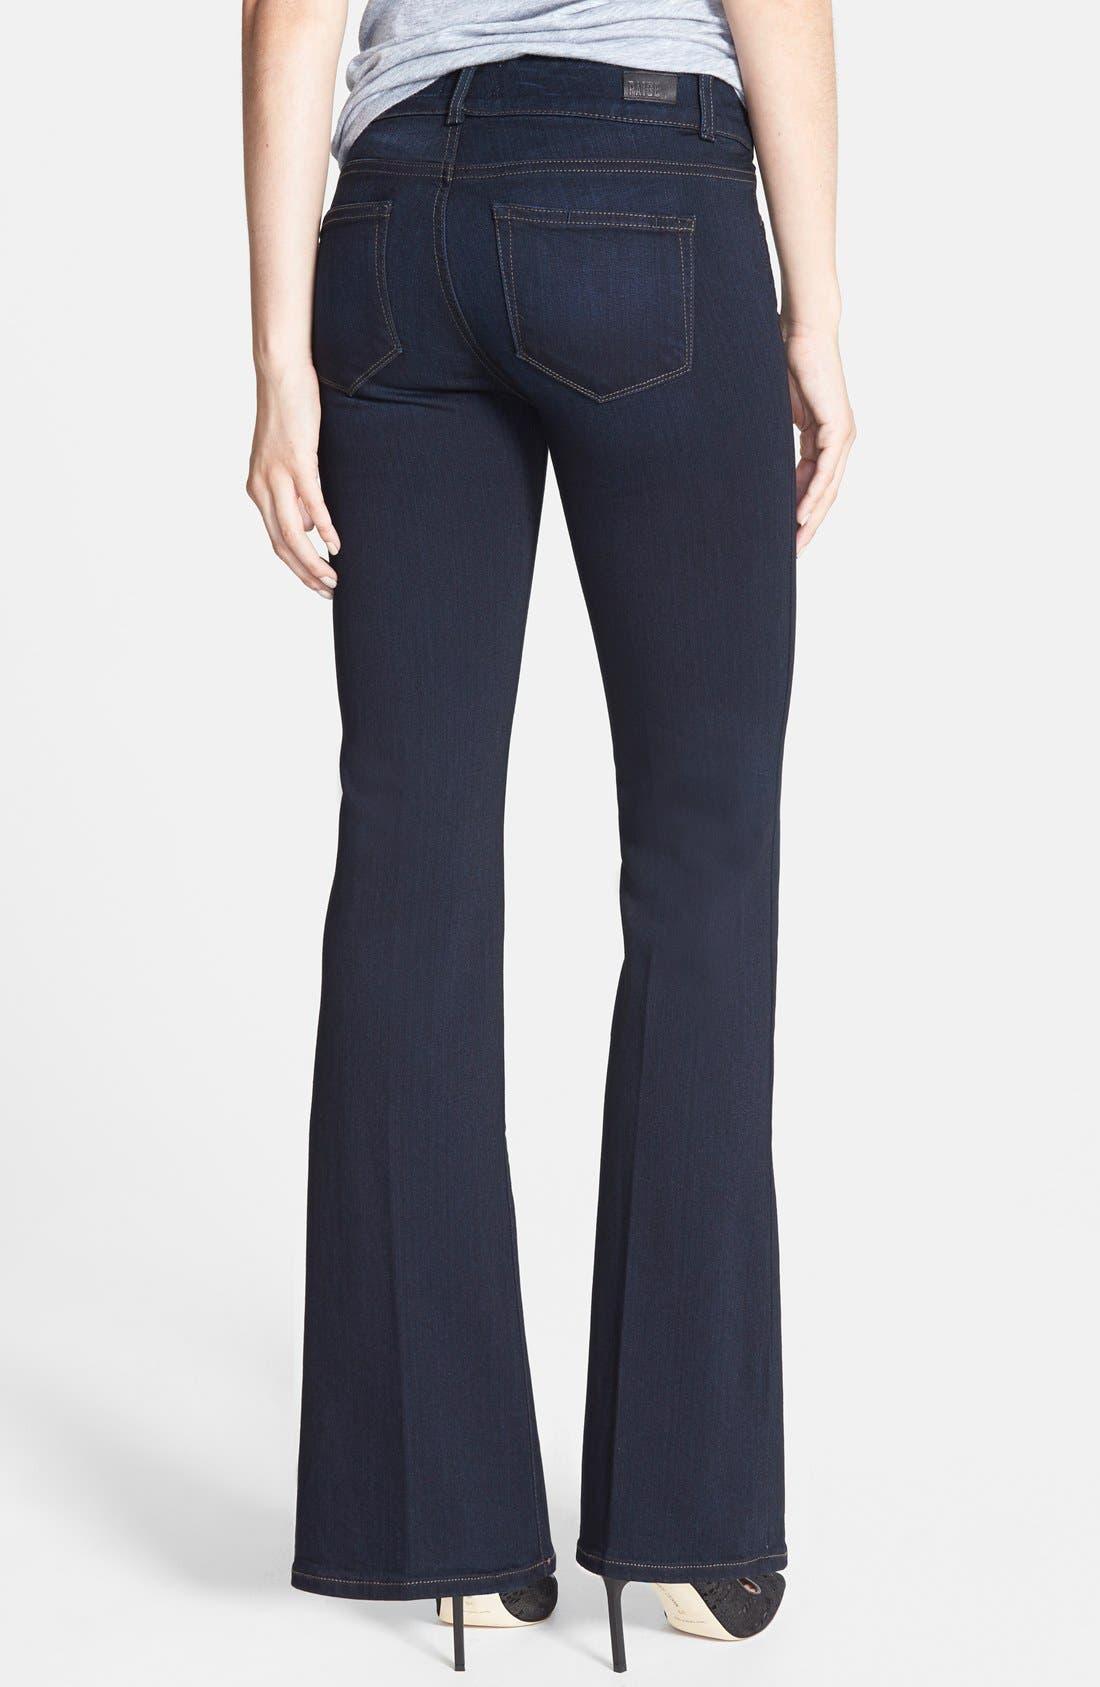 Alternate Image 2  - PAIGE 'Transcend - Hidden Hills' Bootcut Stretch Jeans (Mona) (Petite)